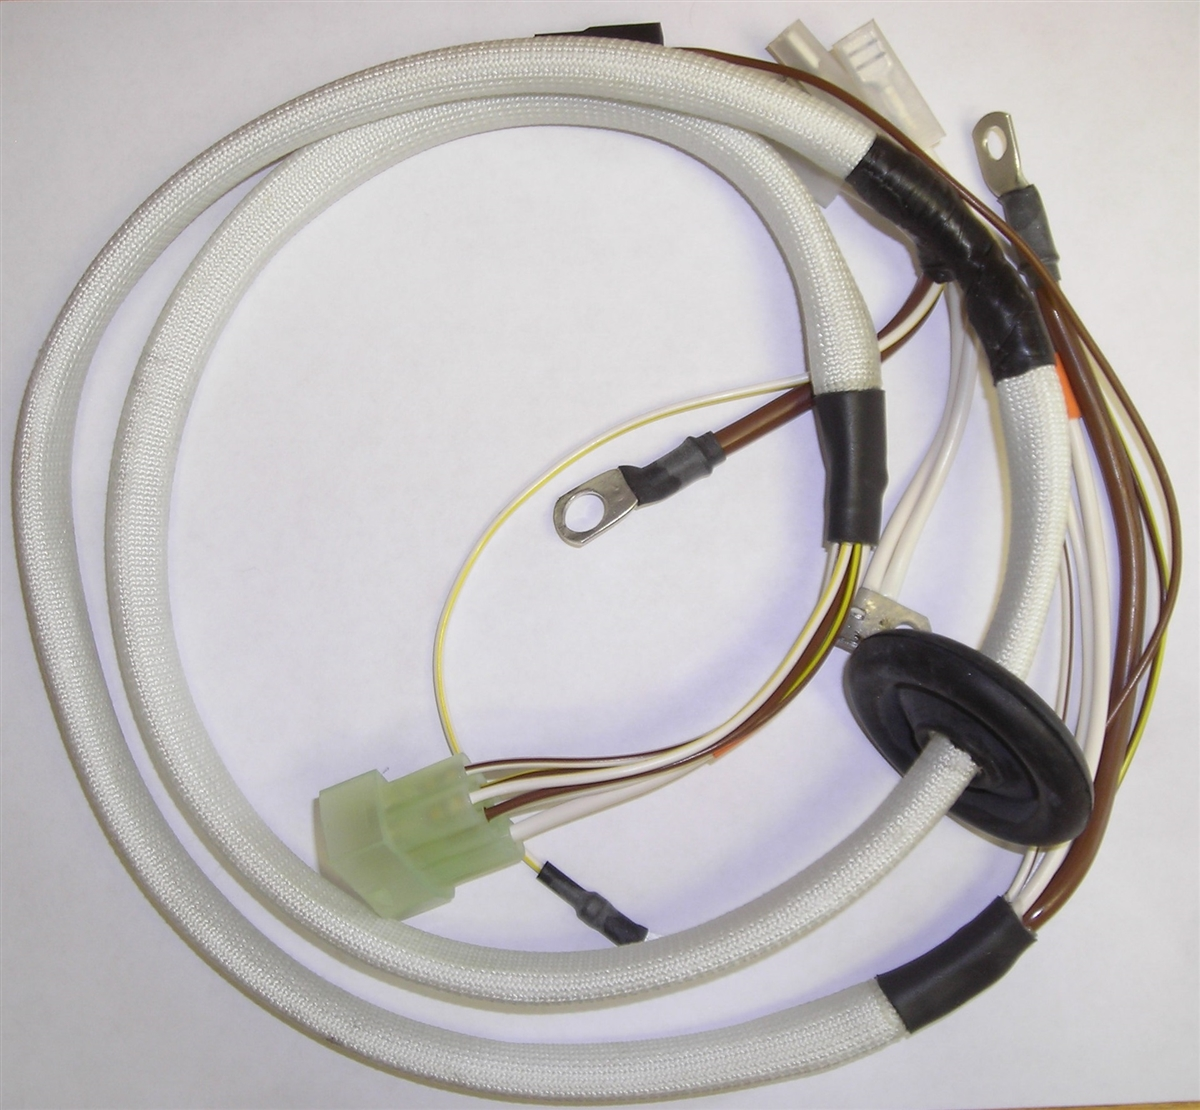 Triumph Tr8 Wiring Harness - Read Online Wiring Diagram on legacy wiring diagram, celica wiring diagram, honda wiring diagram, toyota wiring diagram, rx8 wiring diagram, interior wiring diagram, xjs wiring diagram, nissan wiring diagram, motorcycle wiring diagram, grand wagoneer wiring diagram, mazda5 wiring diagram, g37 wiring diagram, engine wiring diagram, mx6 wiring diagram, lesabre wiring diagram, wrx wiring diagram, galant wiring diagram, trans am wiring diagram, evo wiring diagram, challenger wiring diagram,